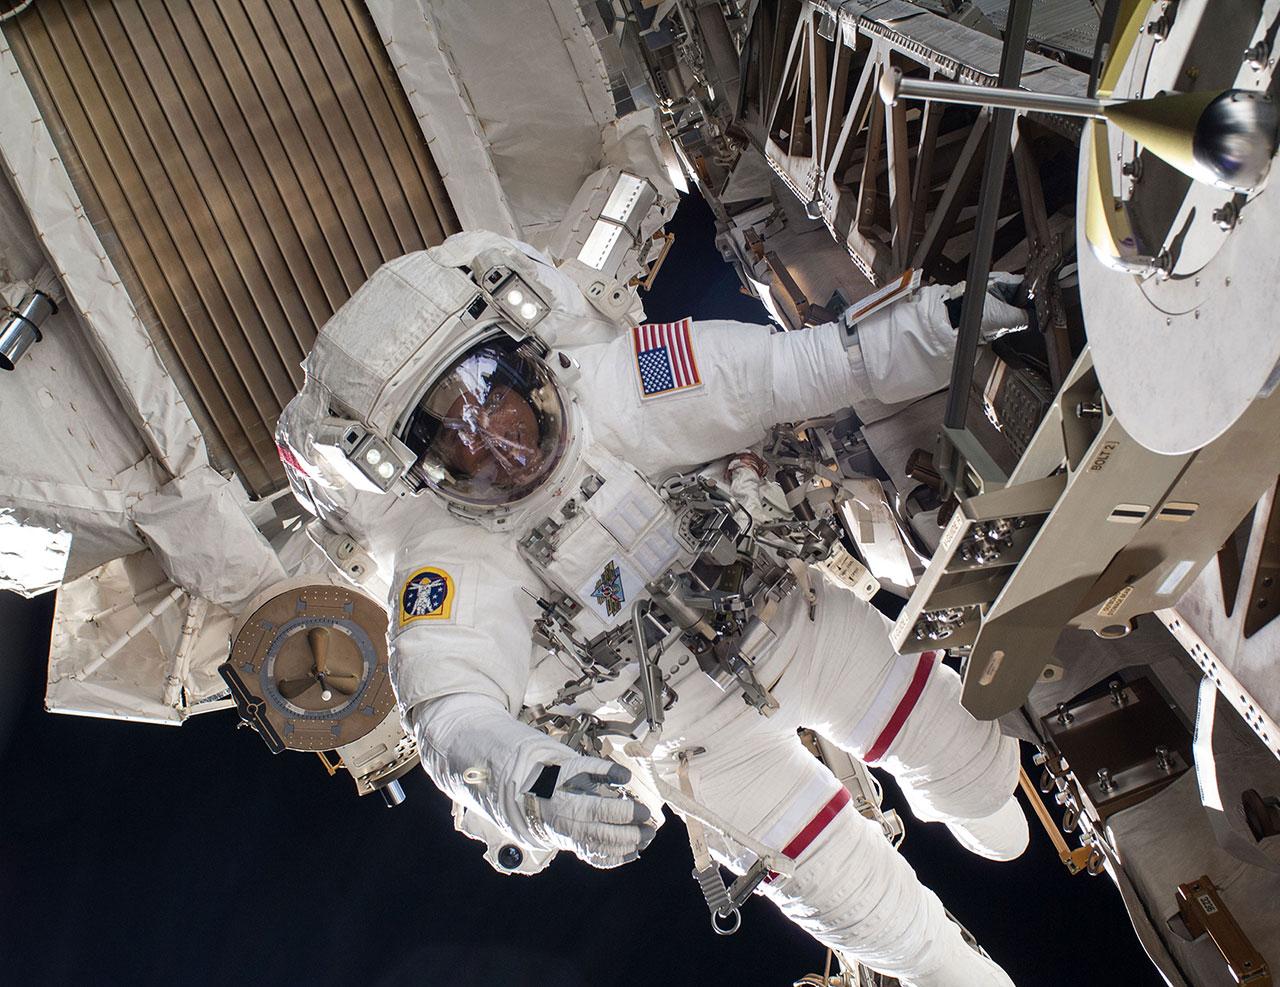 NASA Astronaut Extravehicular Activity ISS